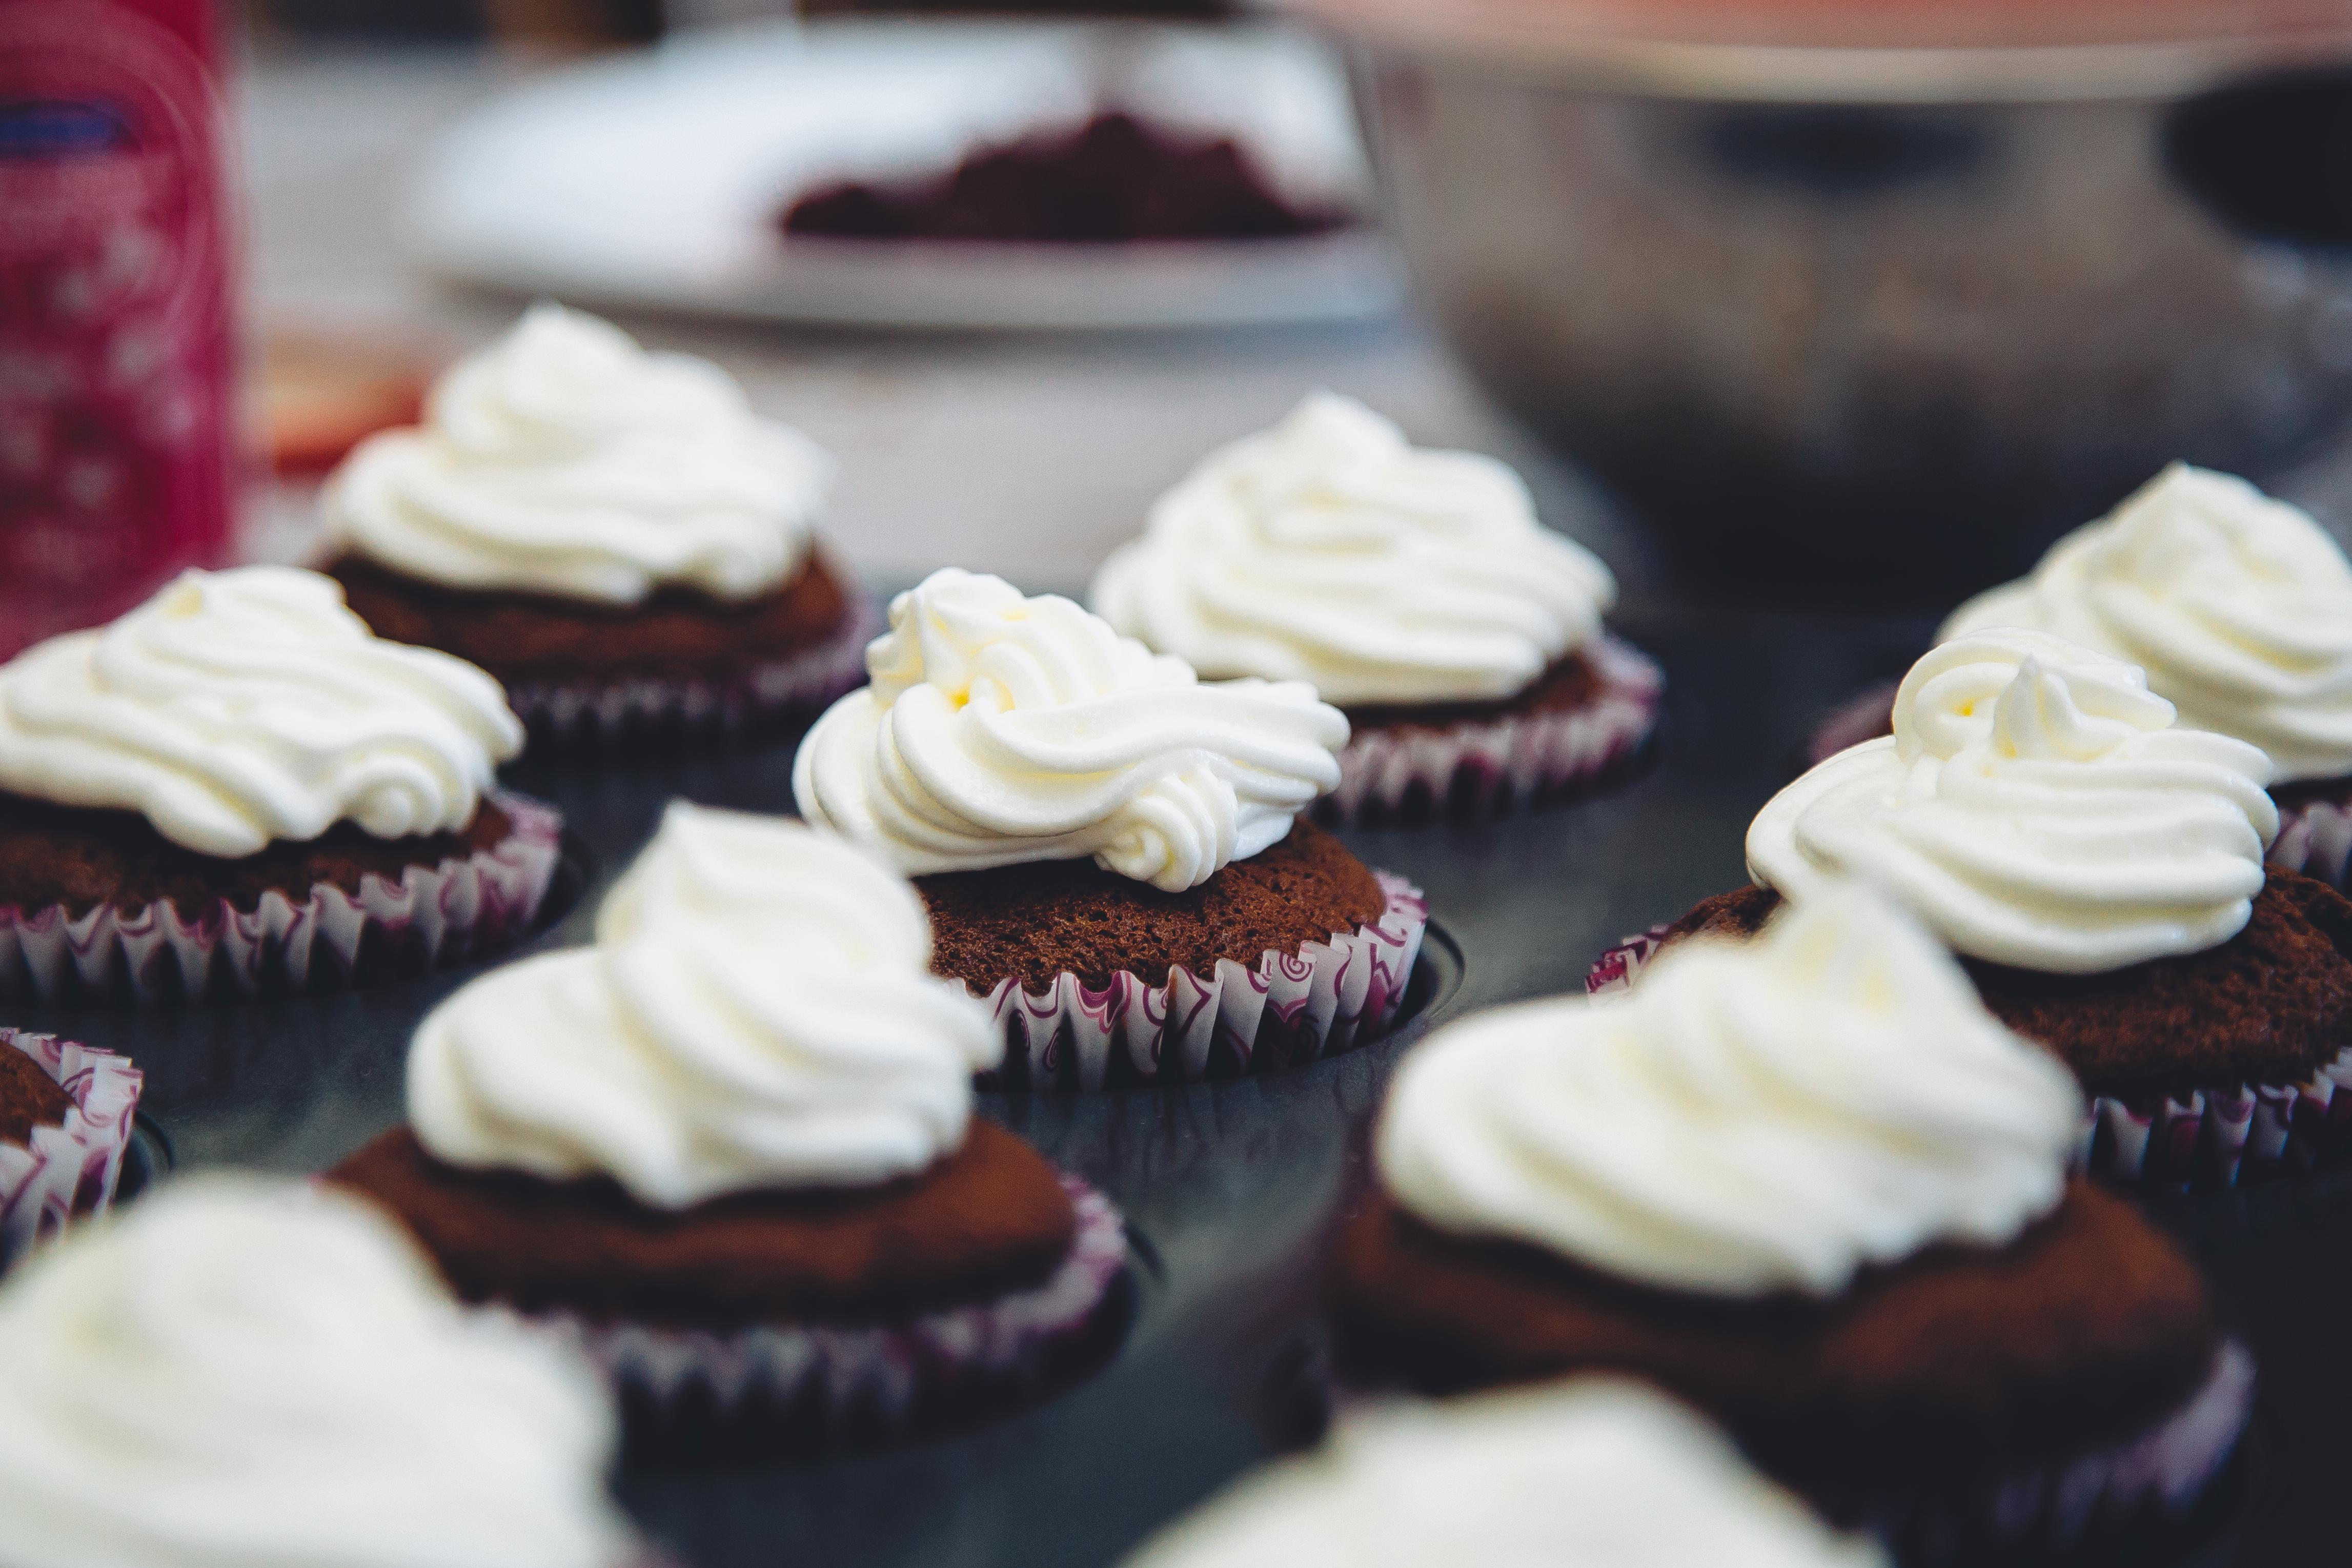 kitchen-cookies-work-cake-8148.jpg (4588×3059)